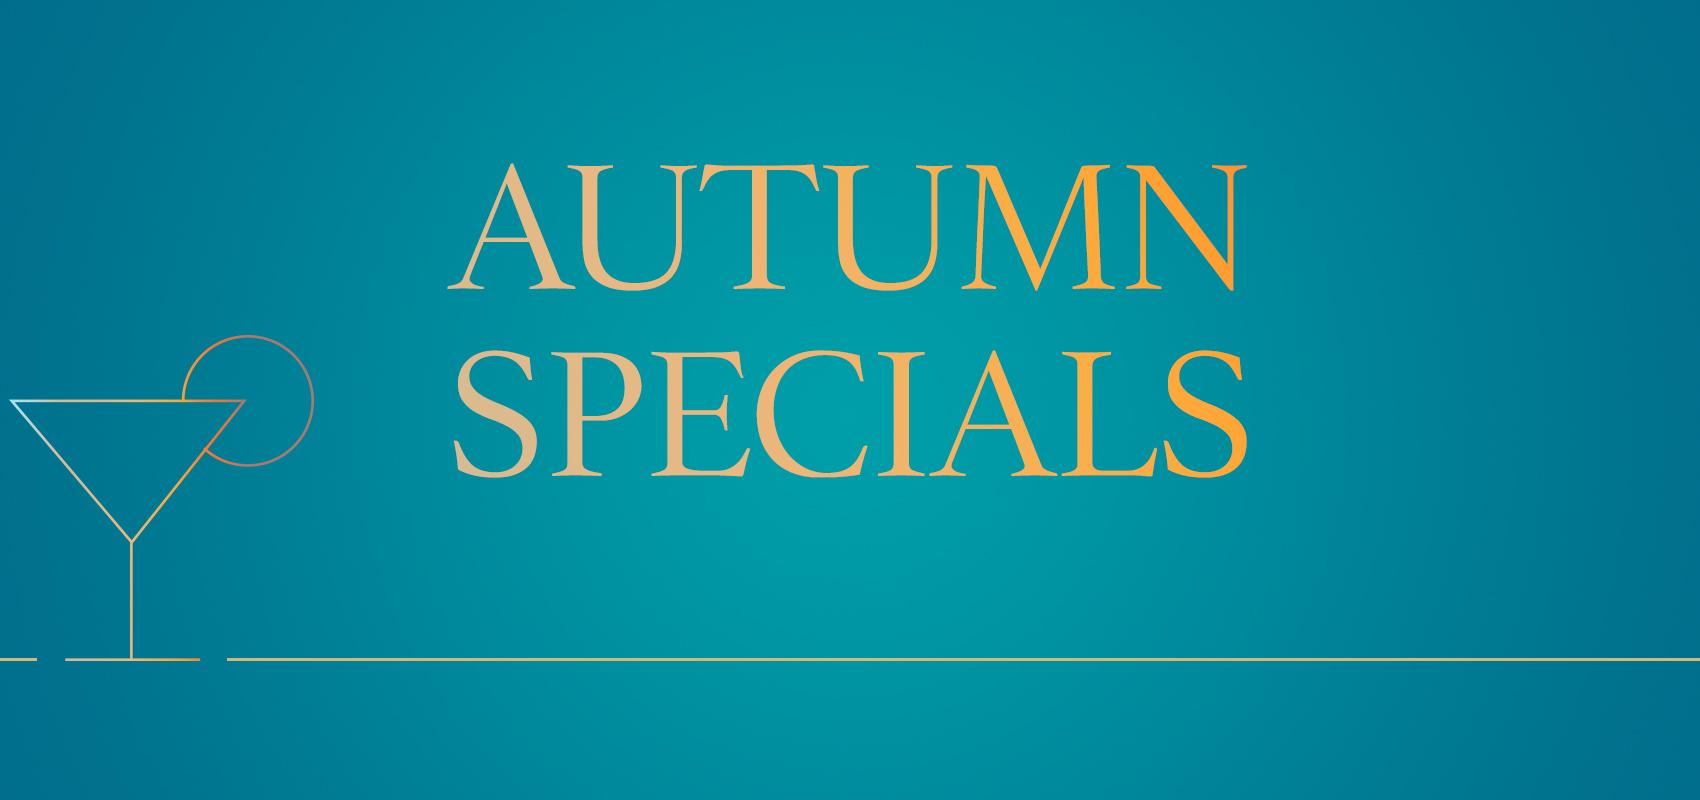 Charles Tyrwhitt Autumn Specials